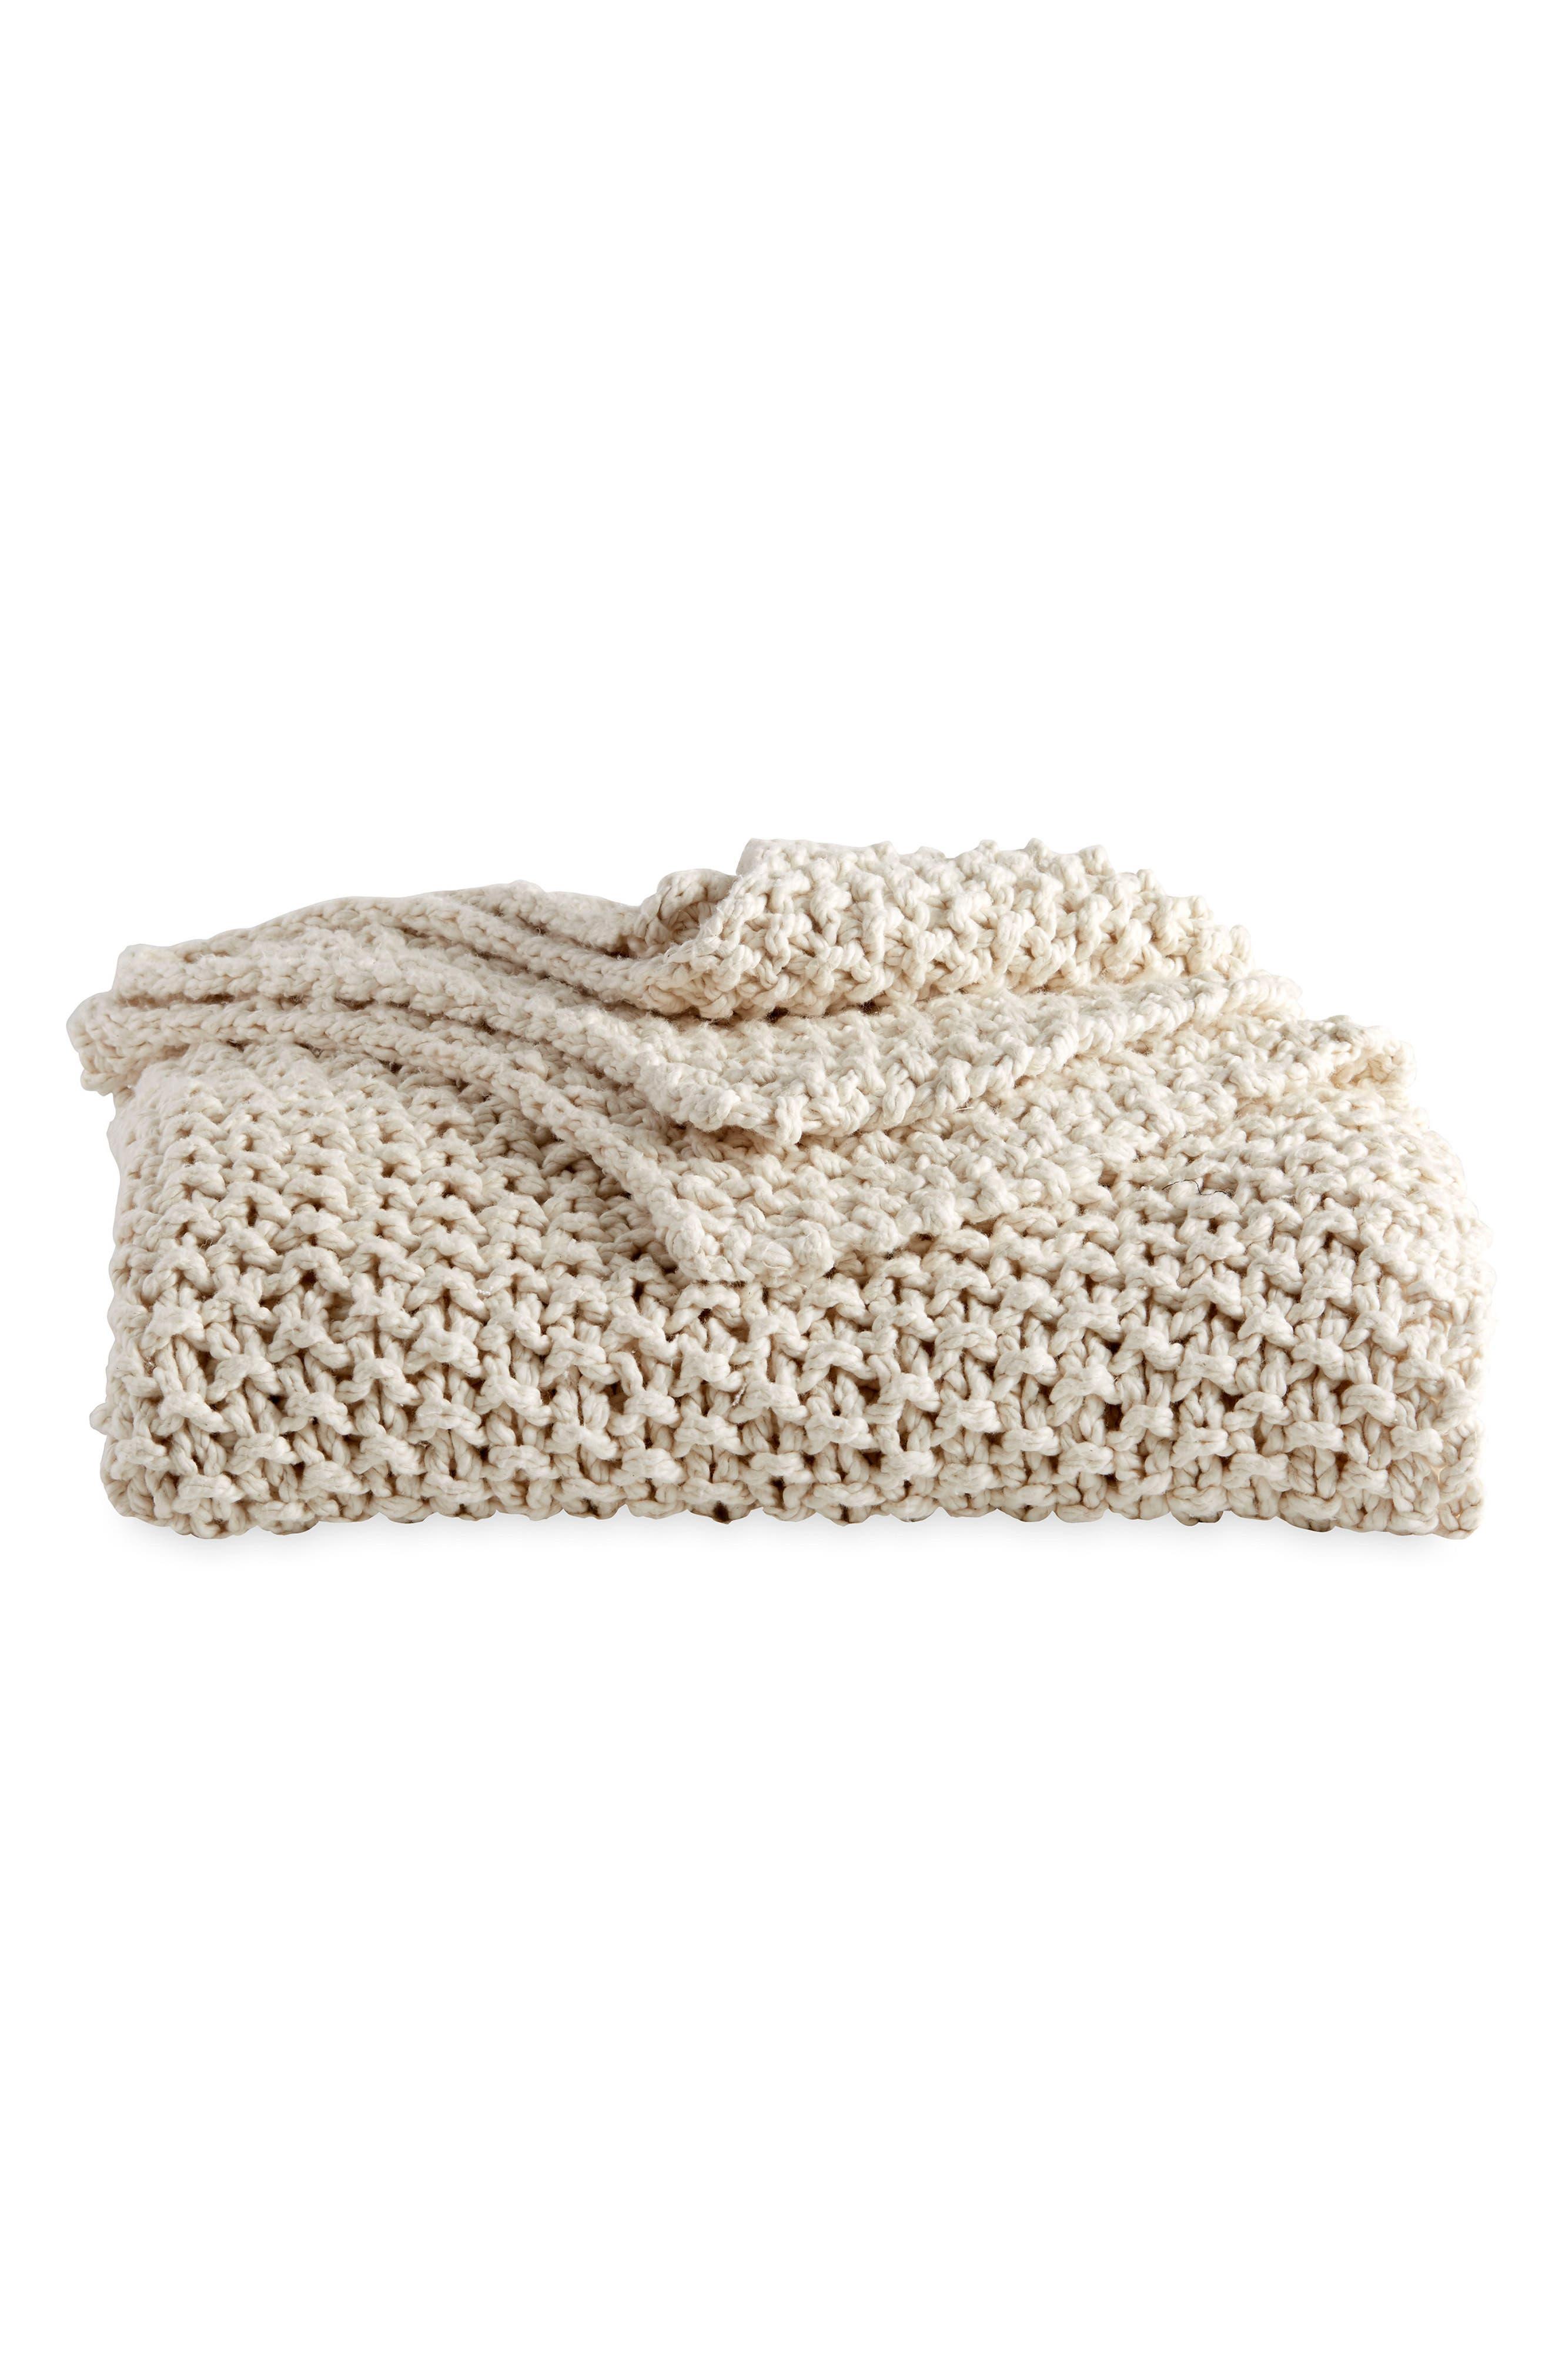 PURE Chunky Knit Throw Blanket,                             Main thumbnail 1, color,                             NATURAL